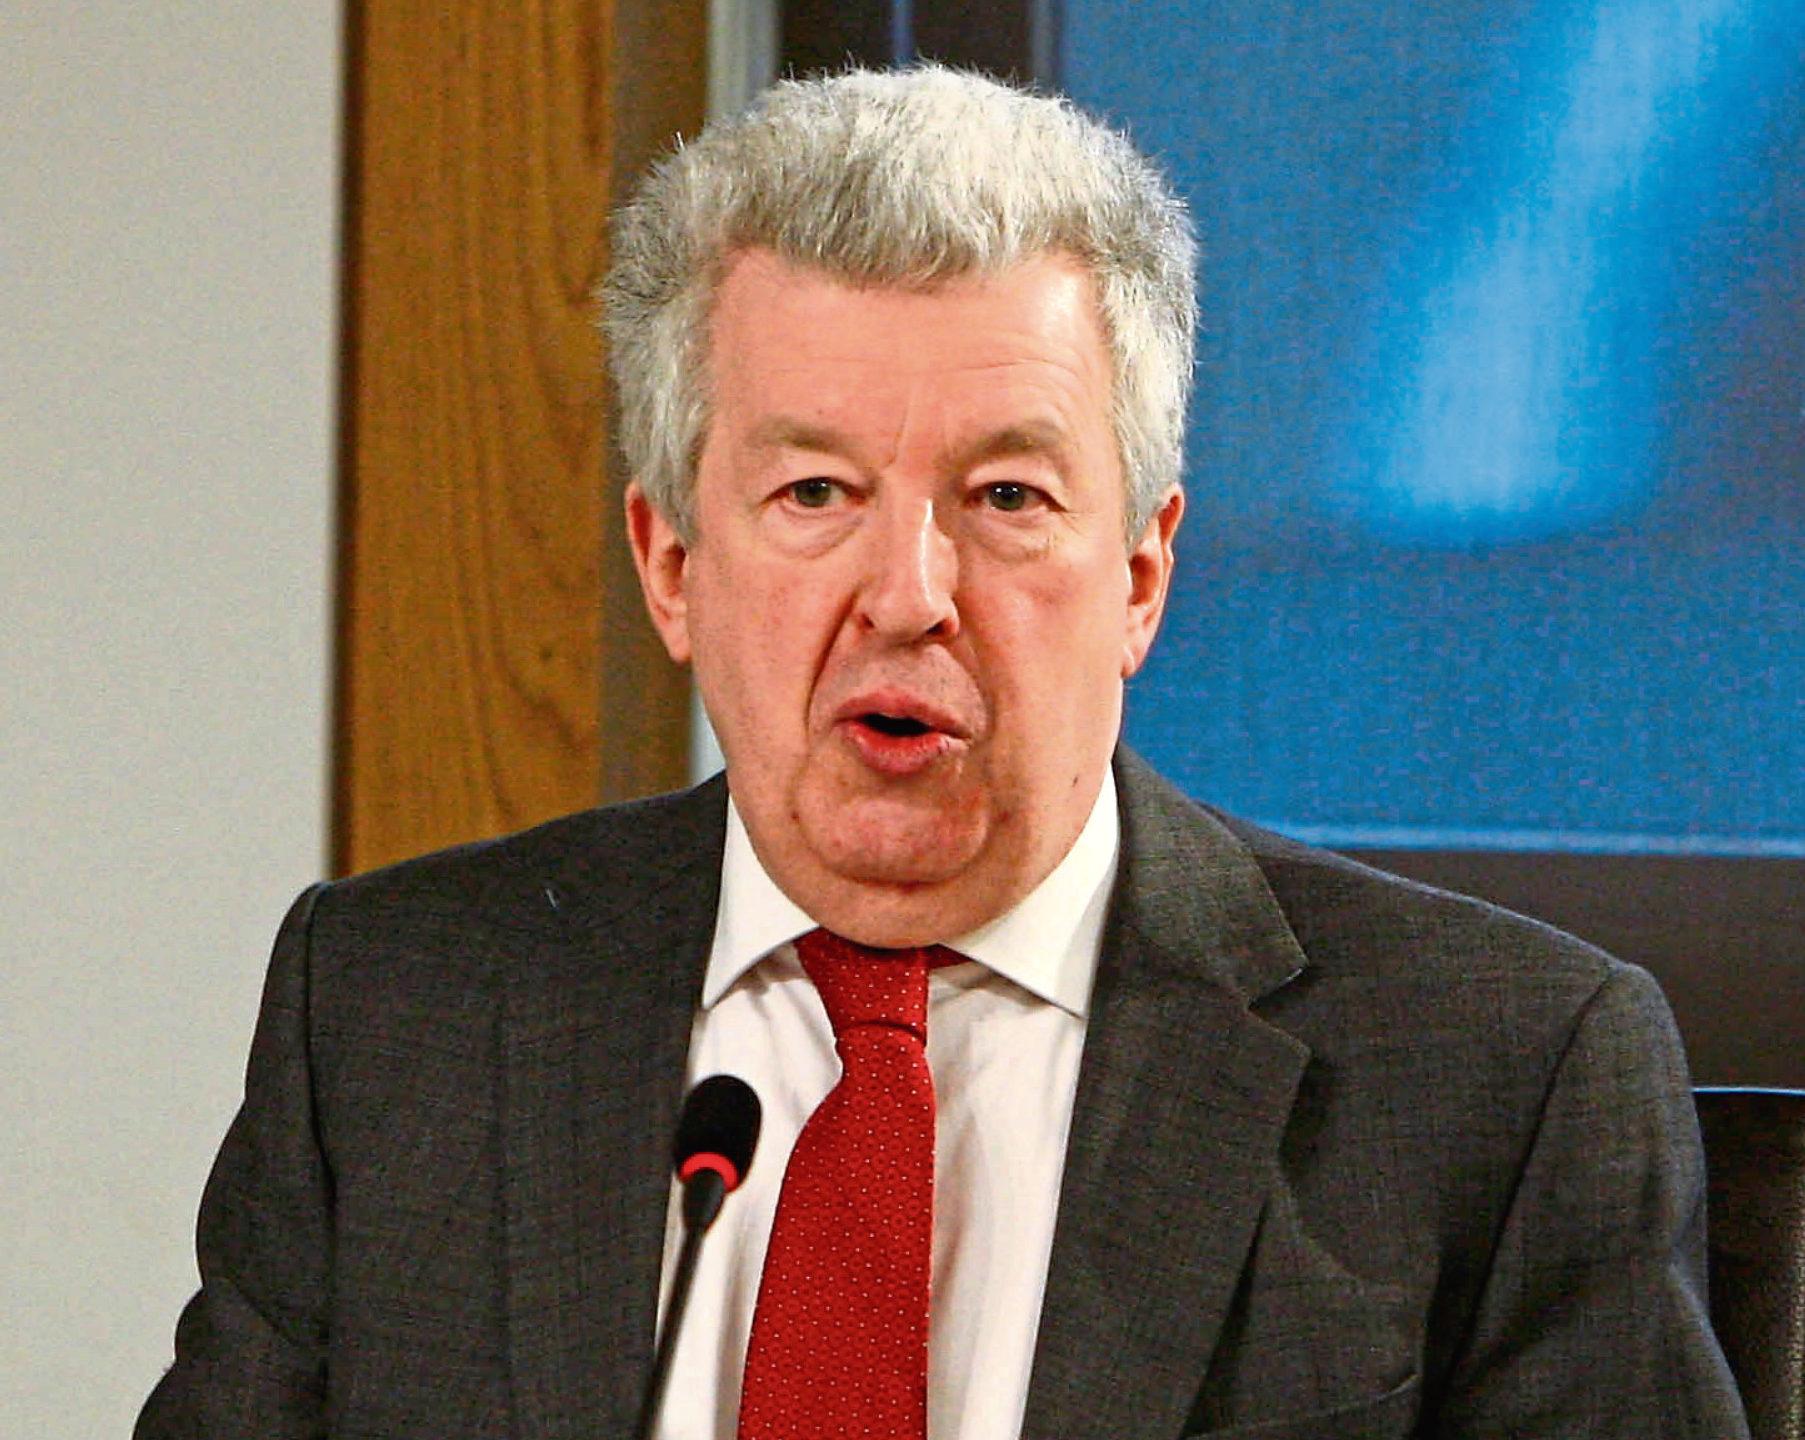 North-east MSP Lewis Macdonald